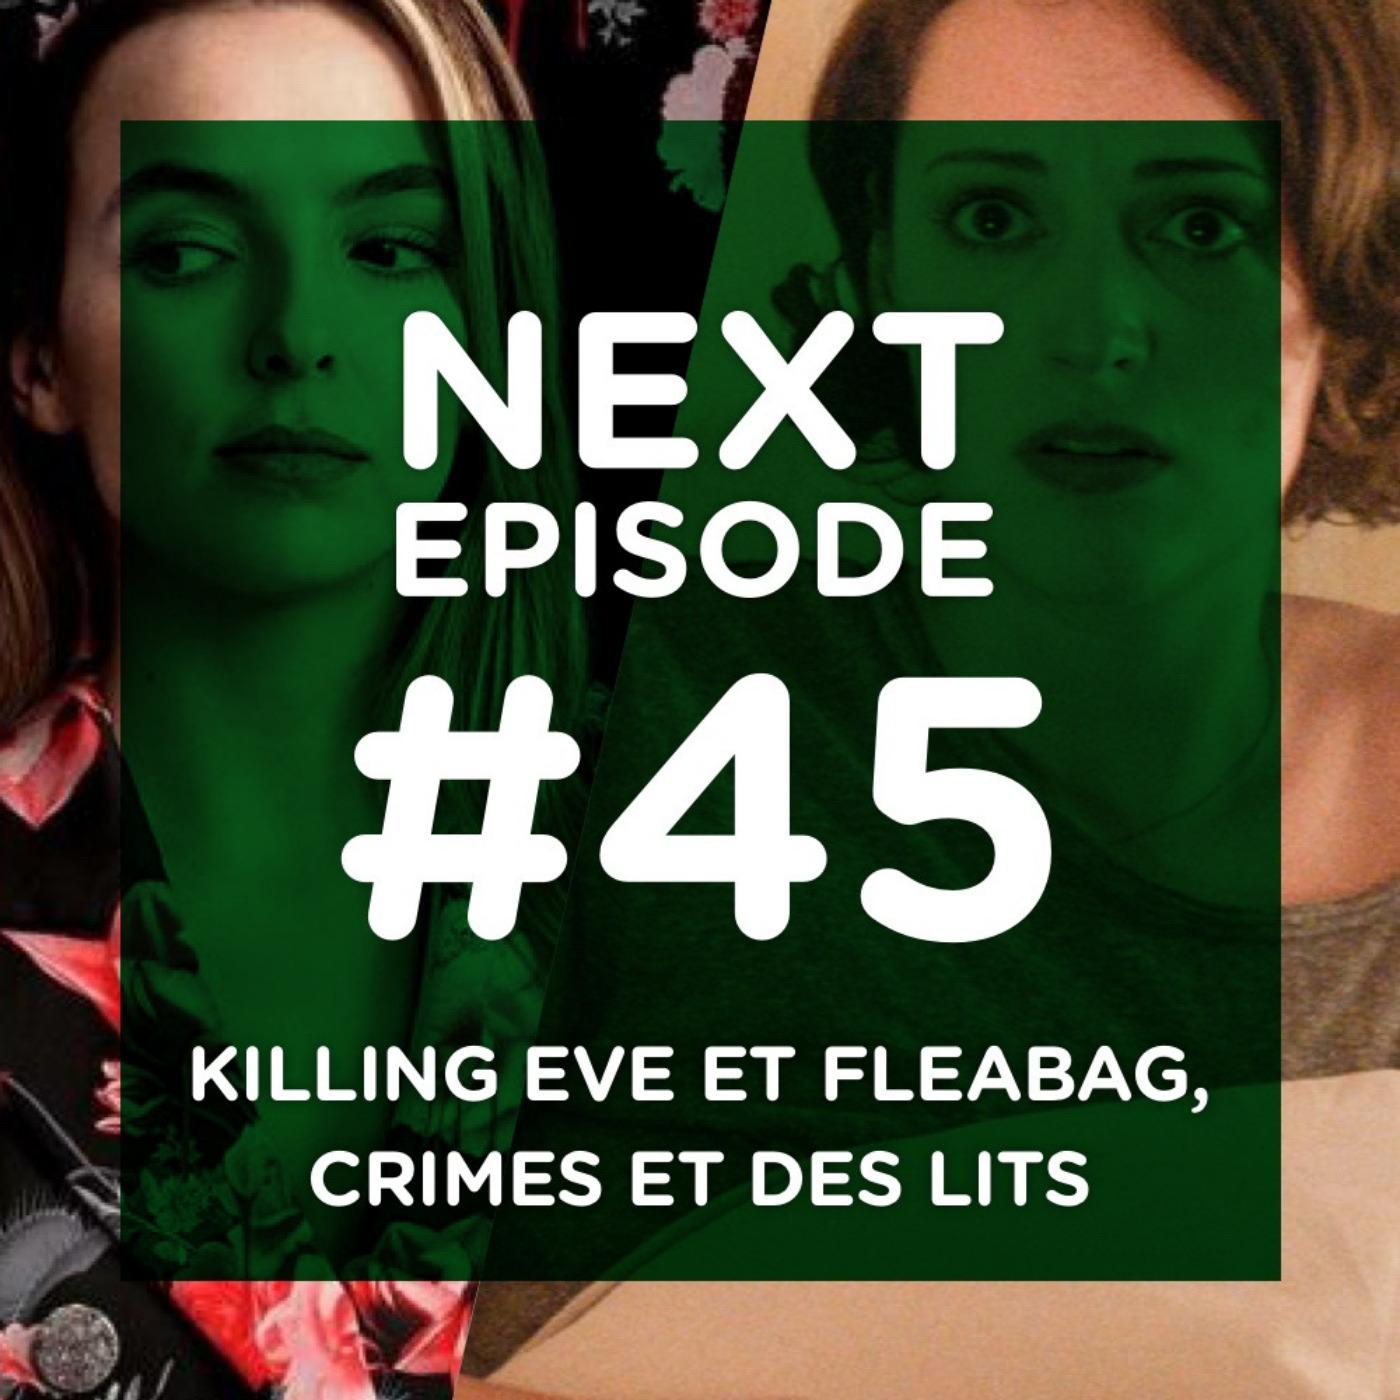 Killing Eve et Fleabag, crimes et des lits